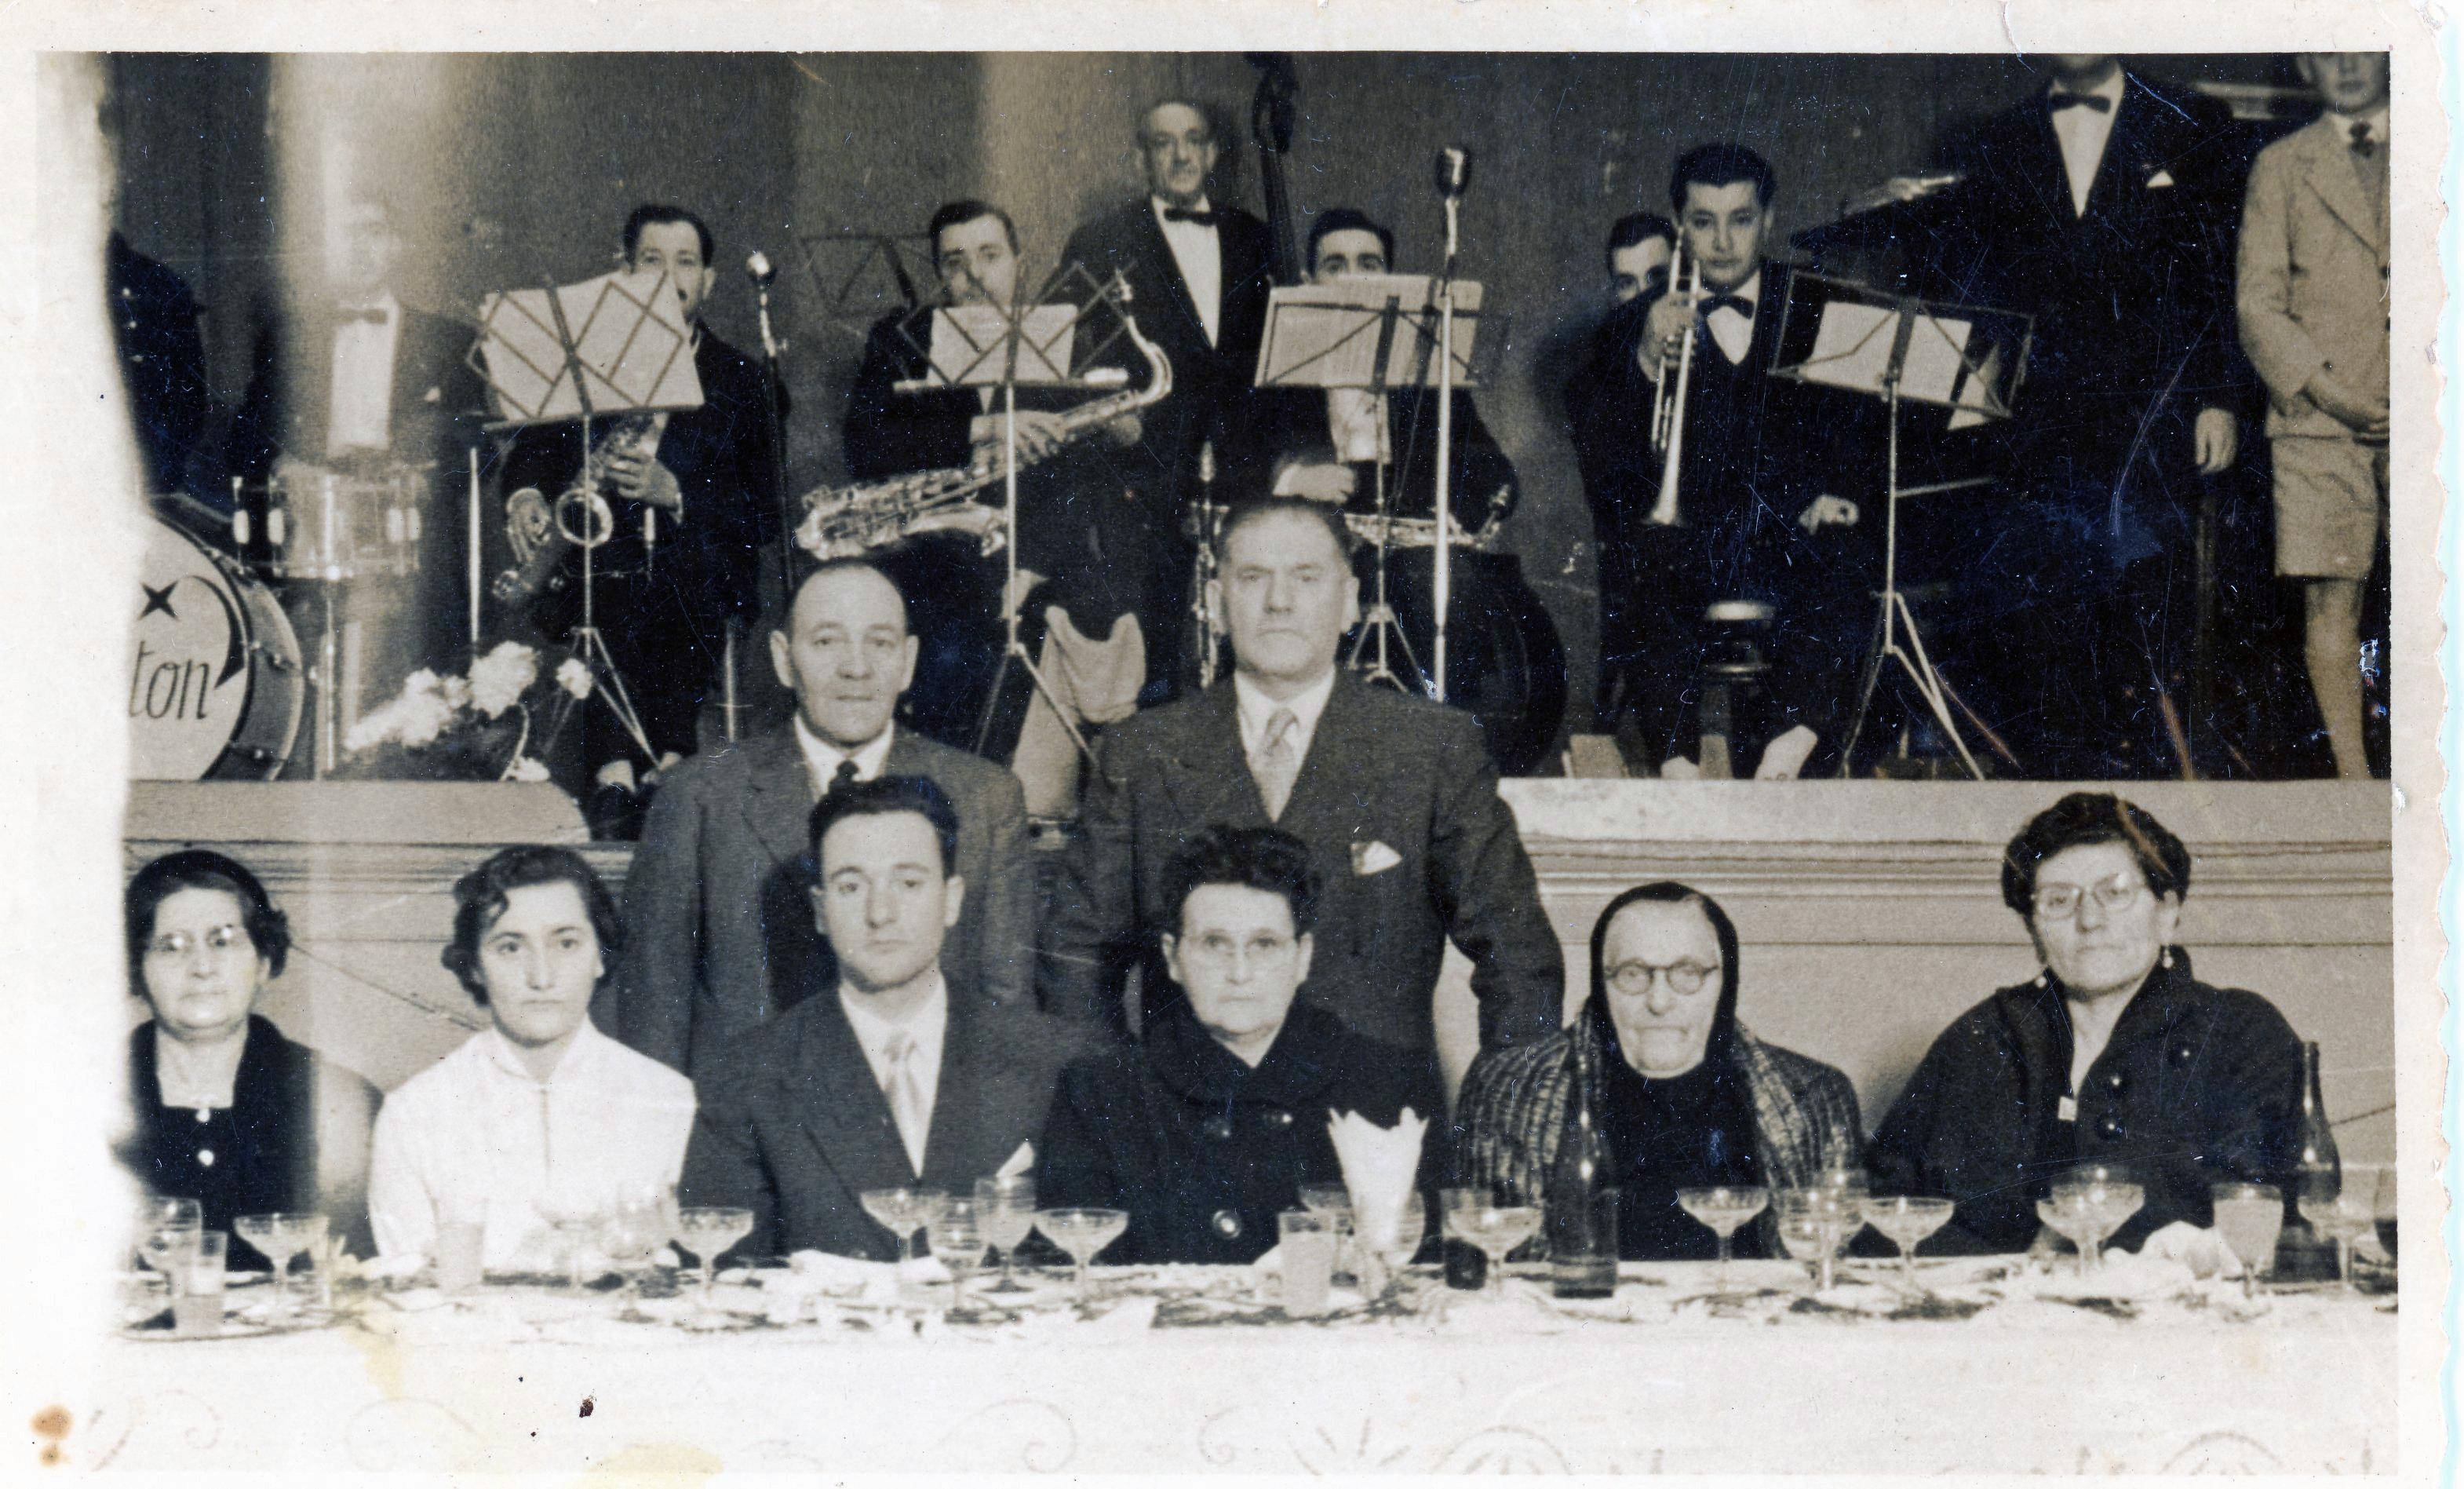 1954-07-03 Santa Fe, Argentina